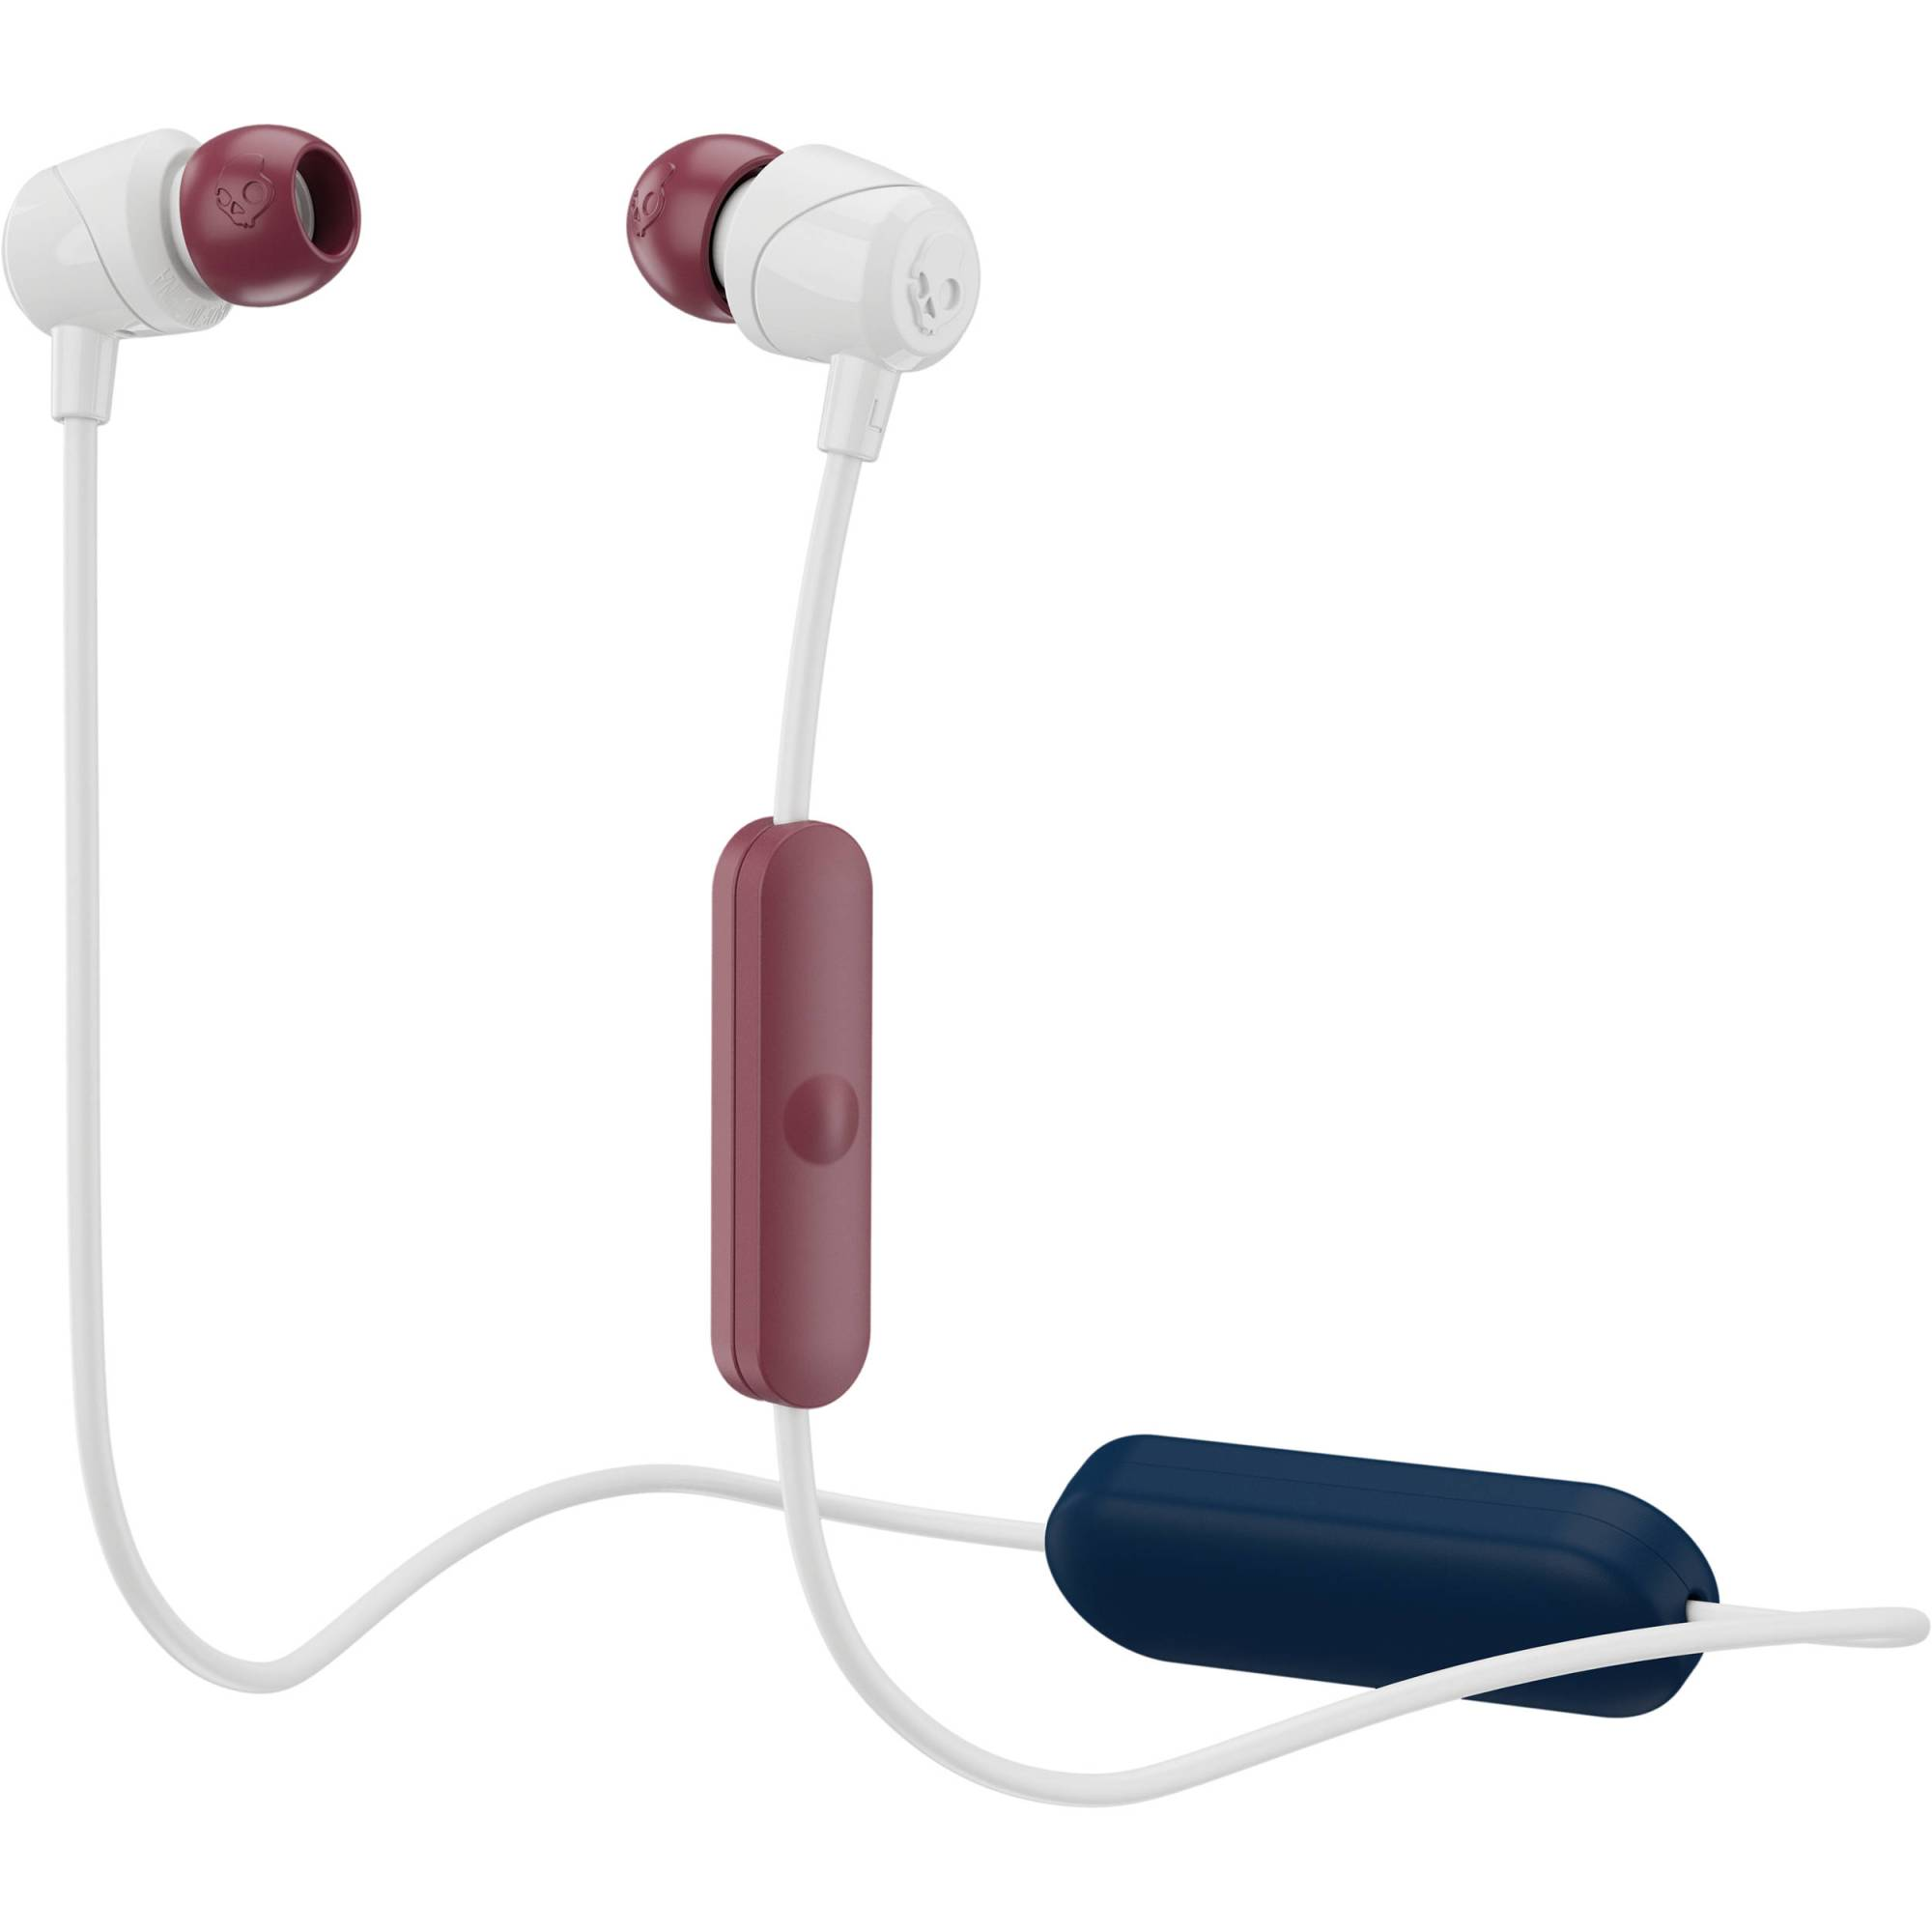 hight resolution of skullcandy jib wireless earbuds vice gray crimson